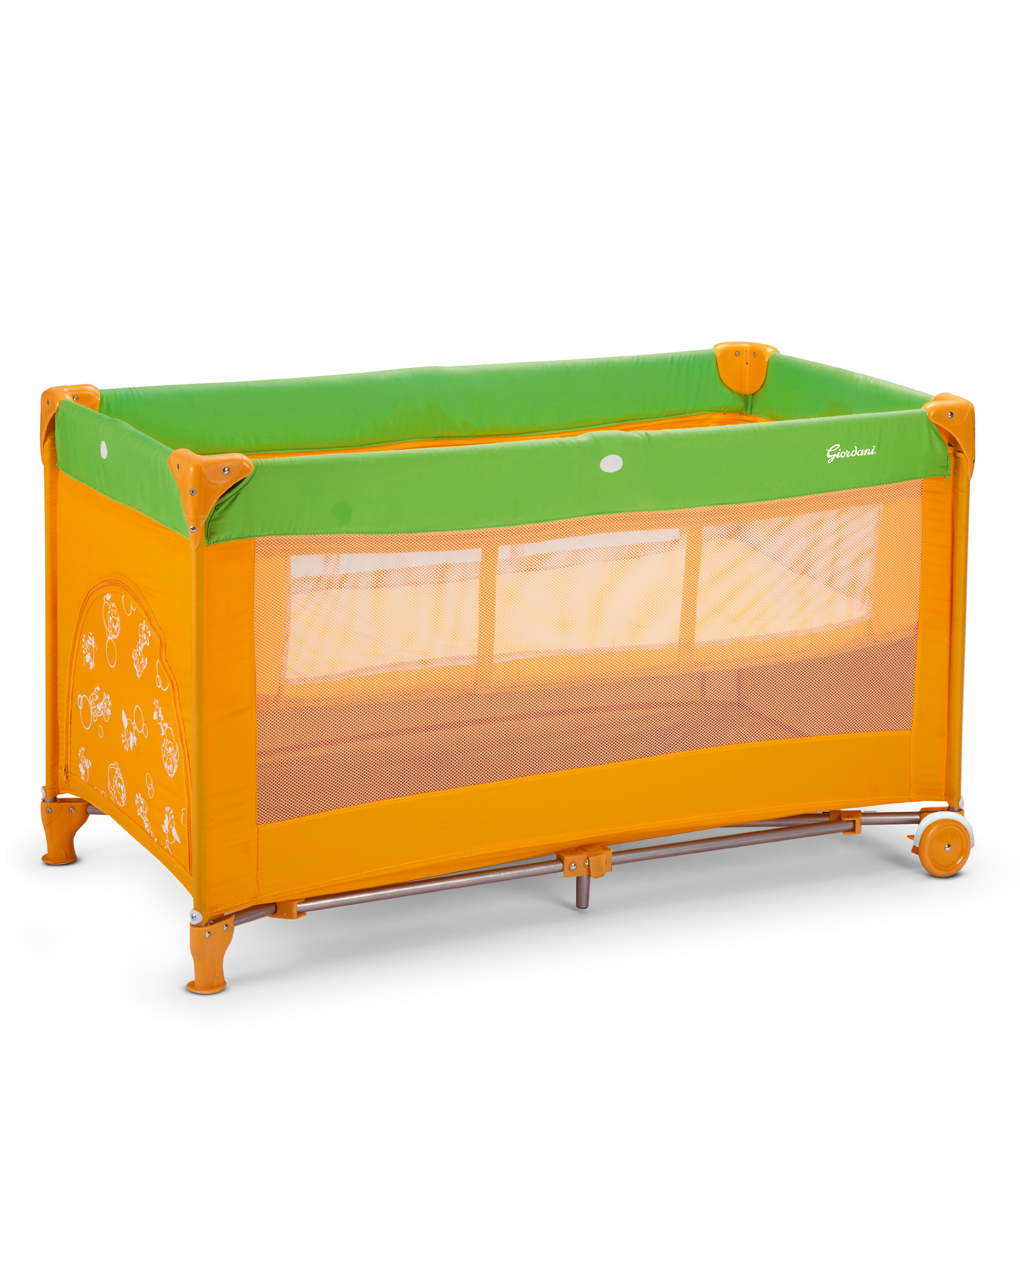 Espreguiçadeira dupla laranja / verde - Giordani